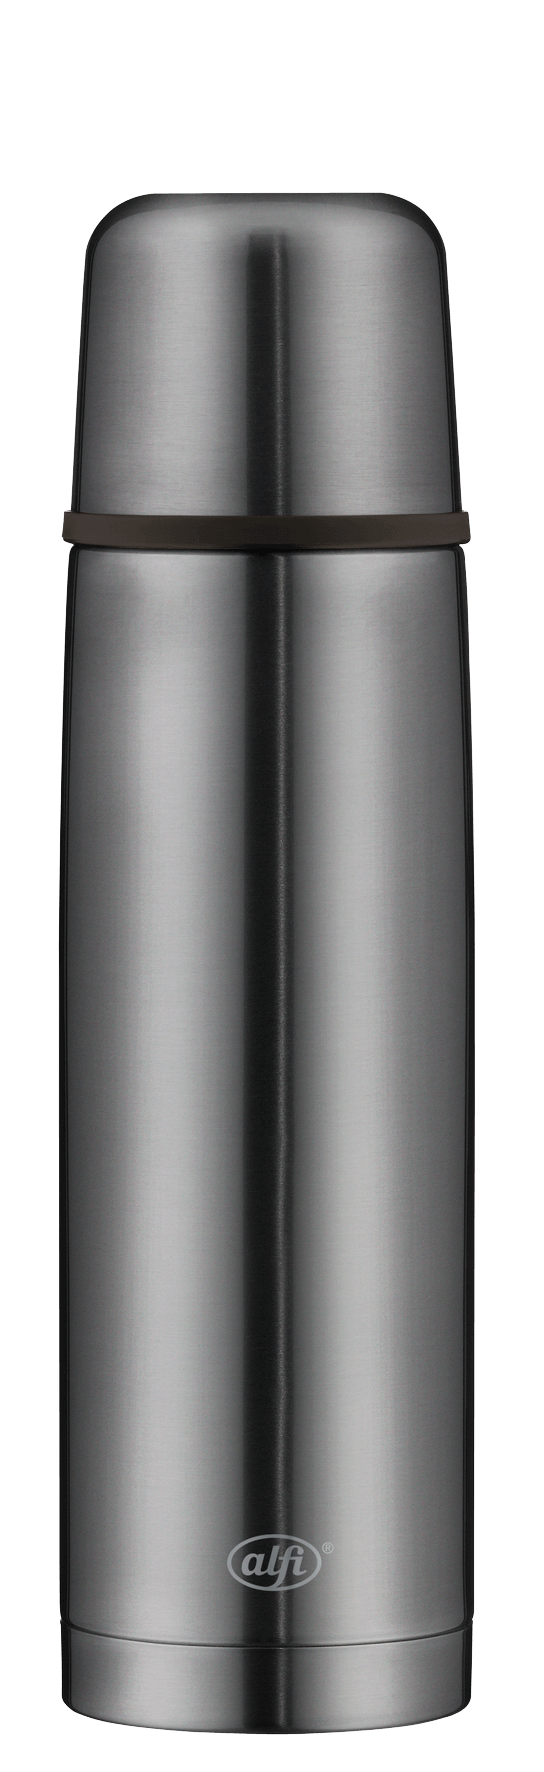 Alfi-Isotherm-Perfect-0-75-L-Cool-Grey